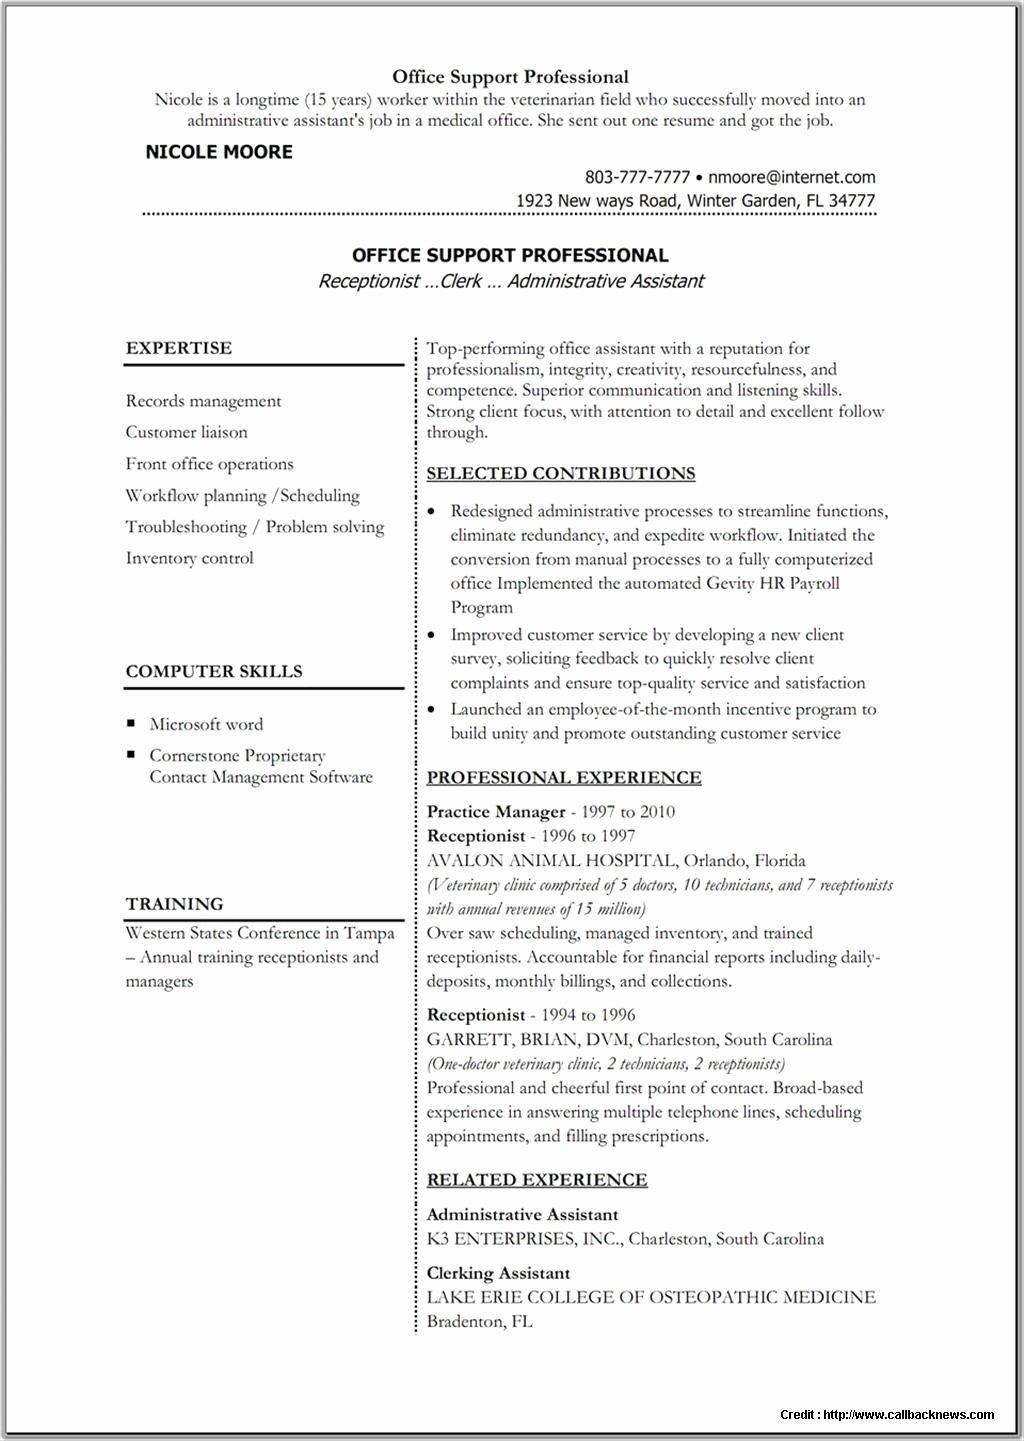 Free Microsoft Word Resume Templates 2013 Resume